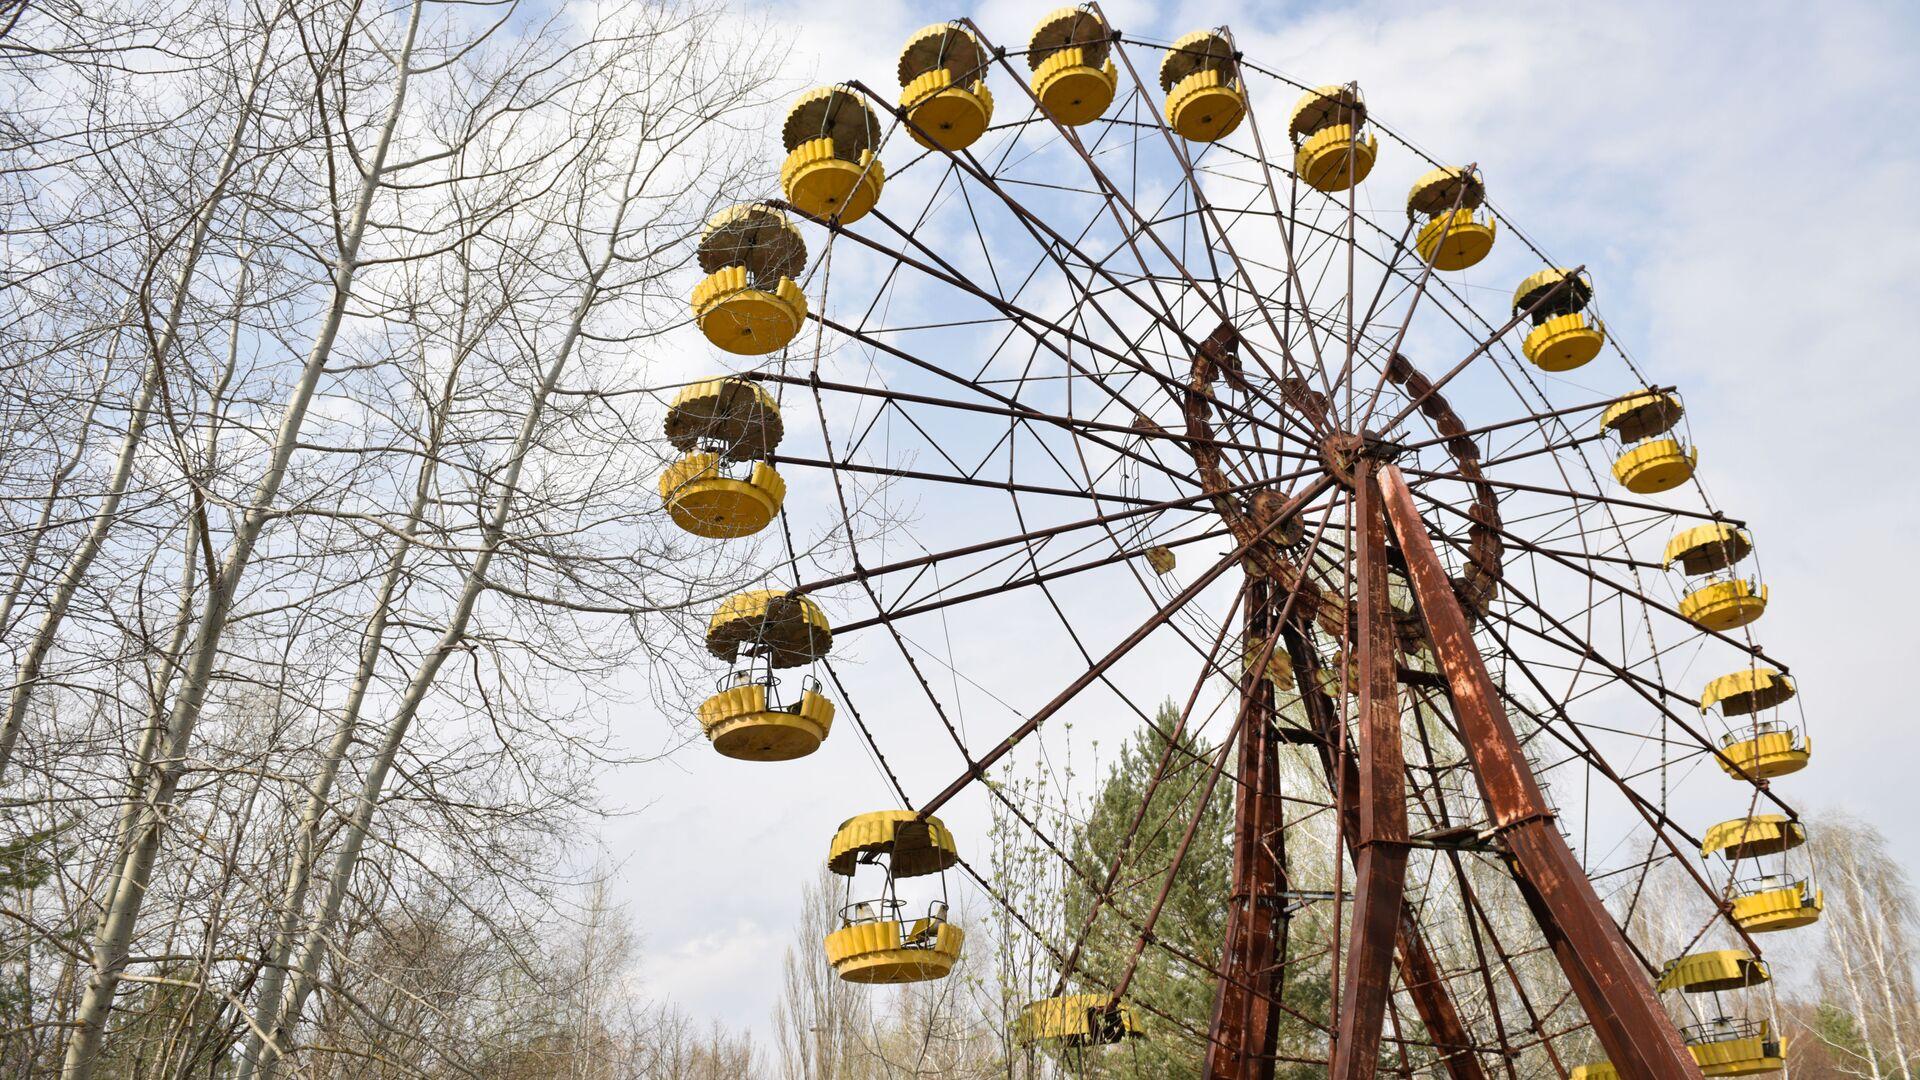 La zona de exclusión de Chernóbil - Sputnik Mundo, 1920, 23.09.2020